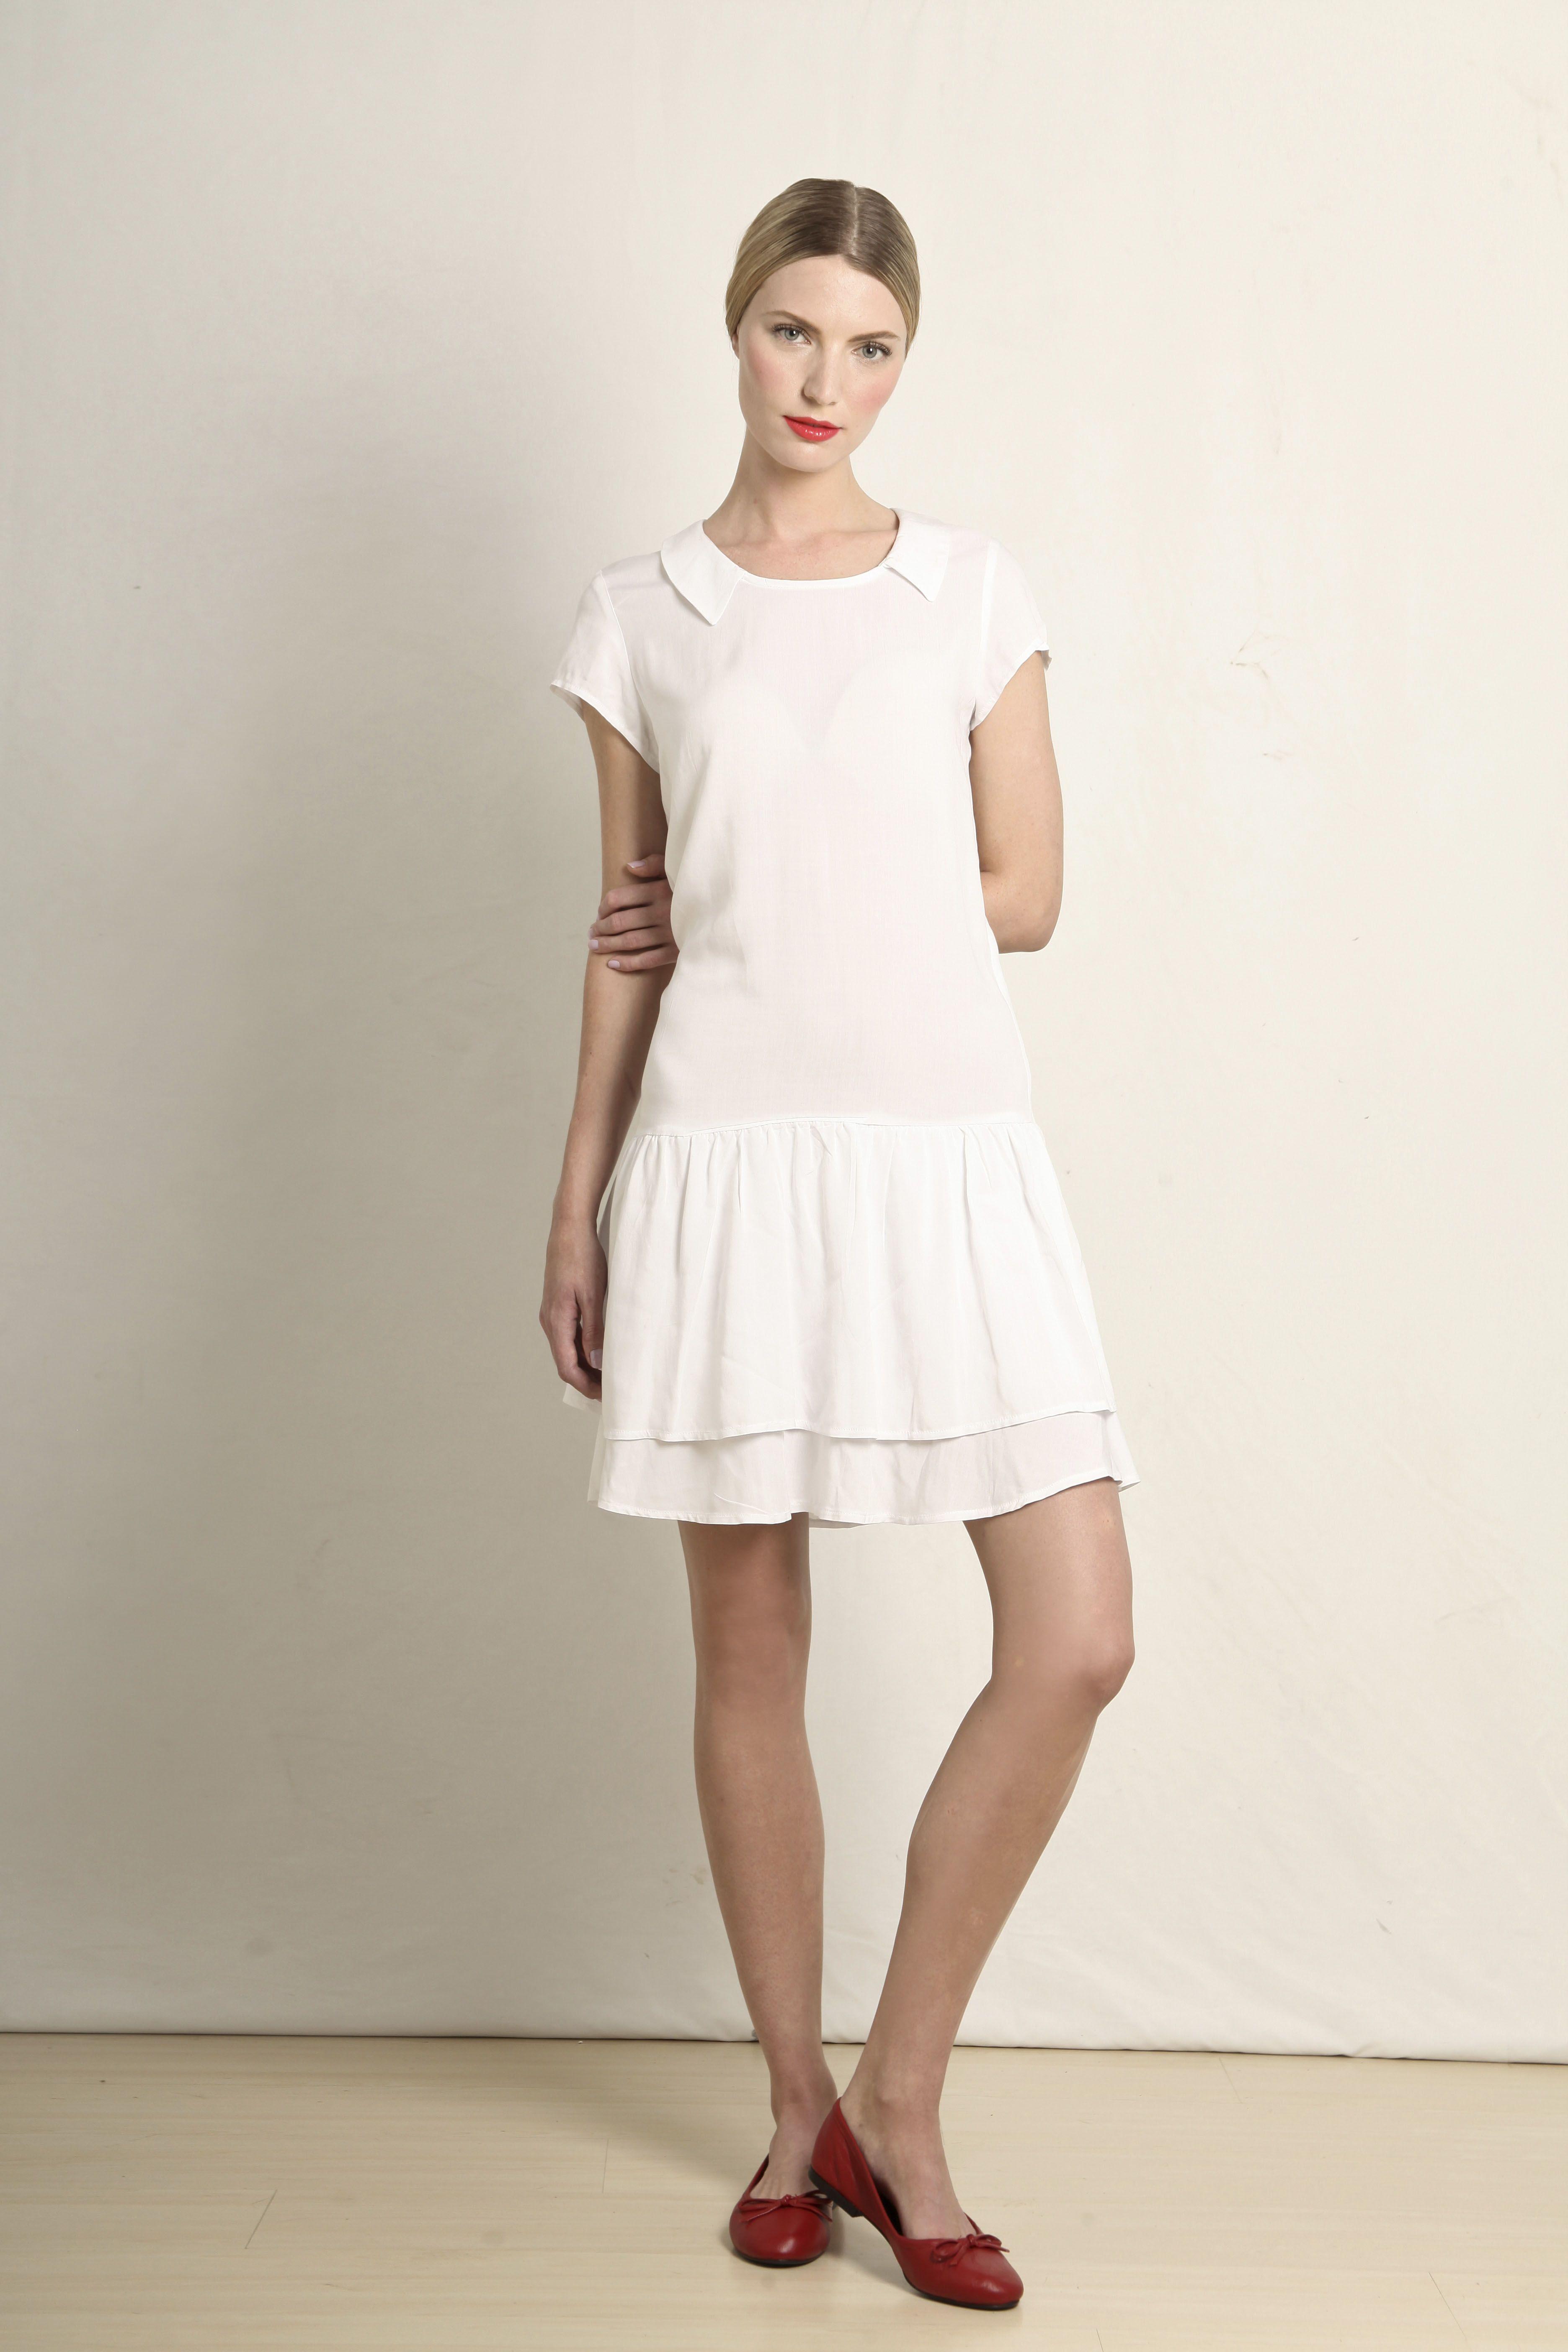 Chloe dress in white  GB202-wht  R699.00  www.georgieb.com